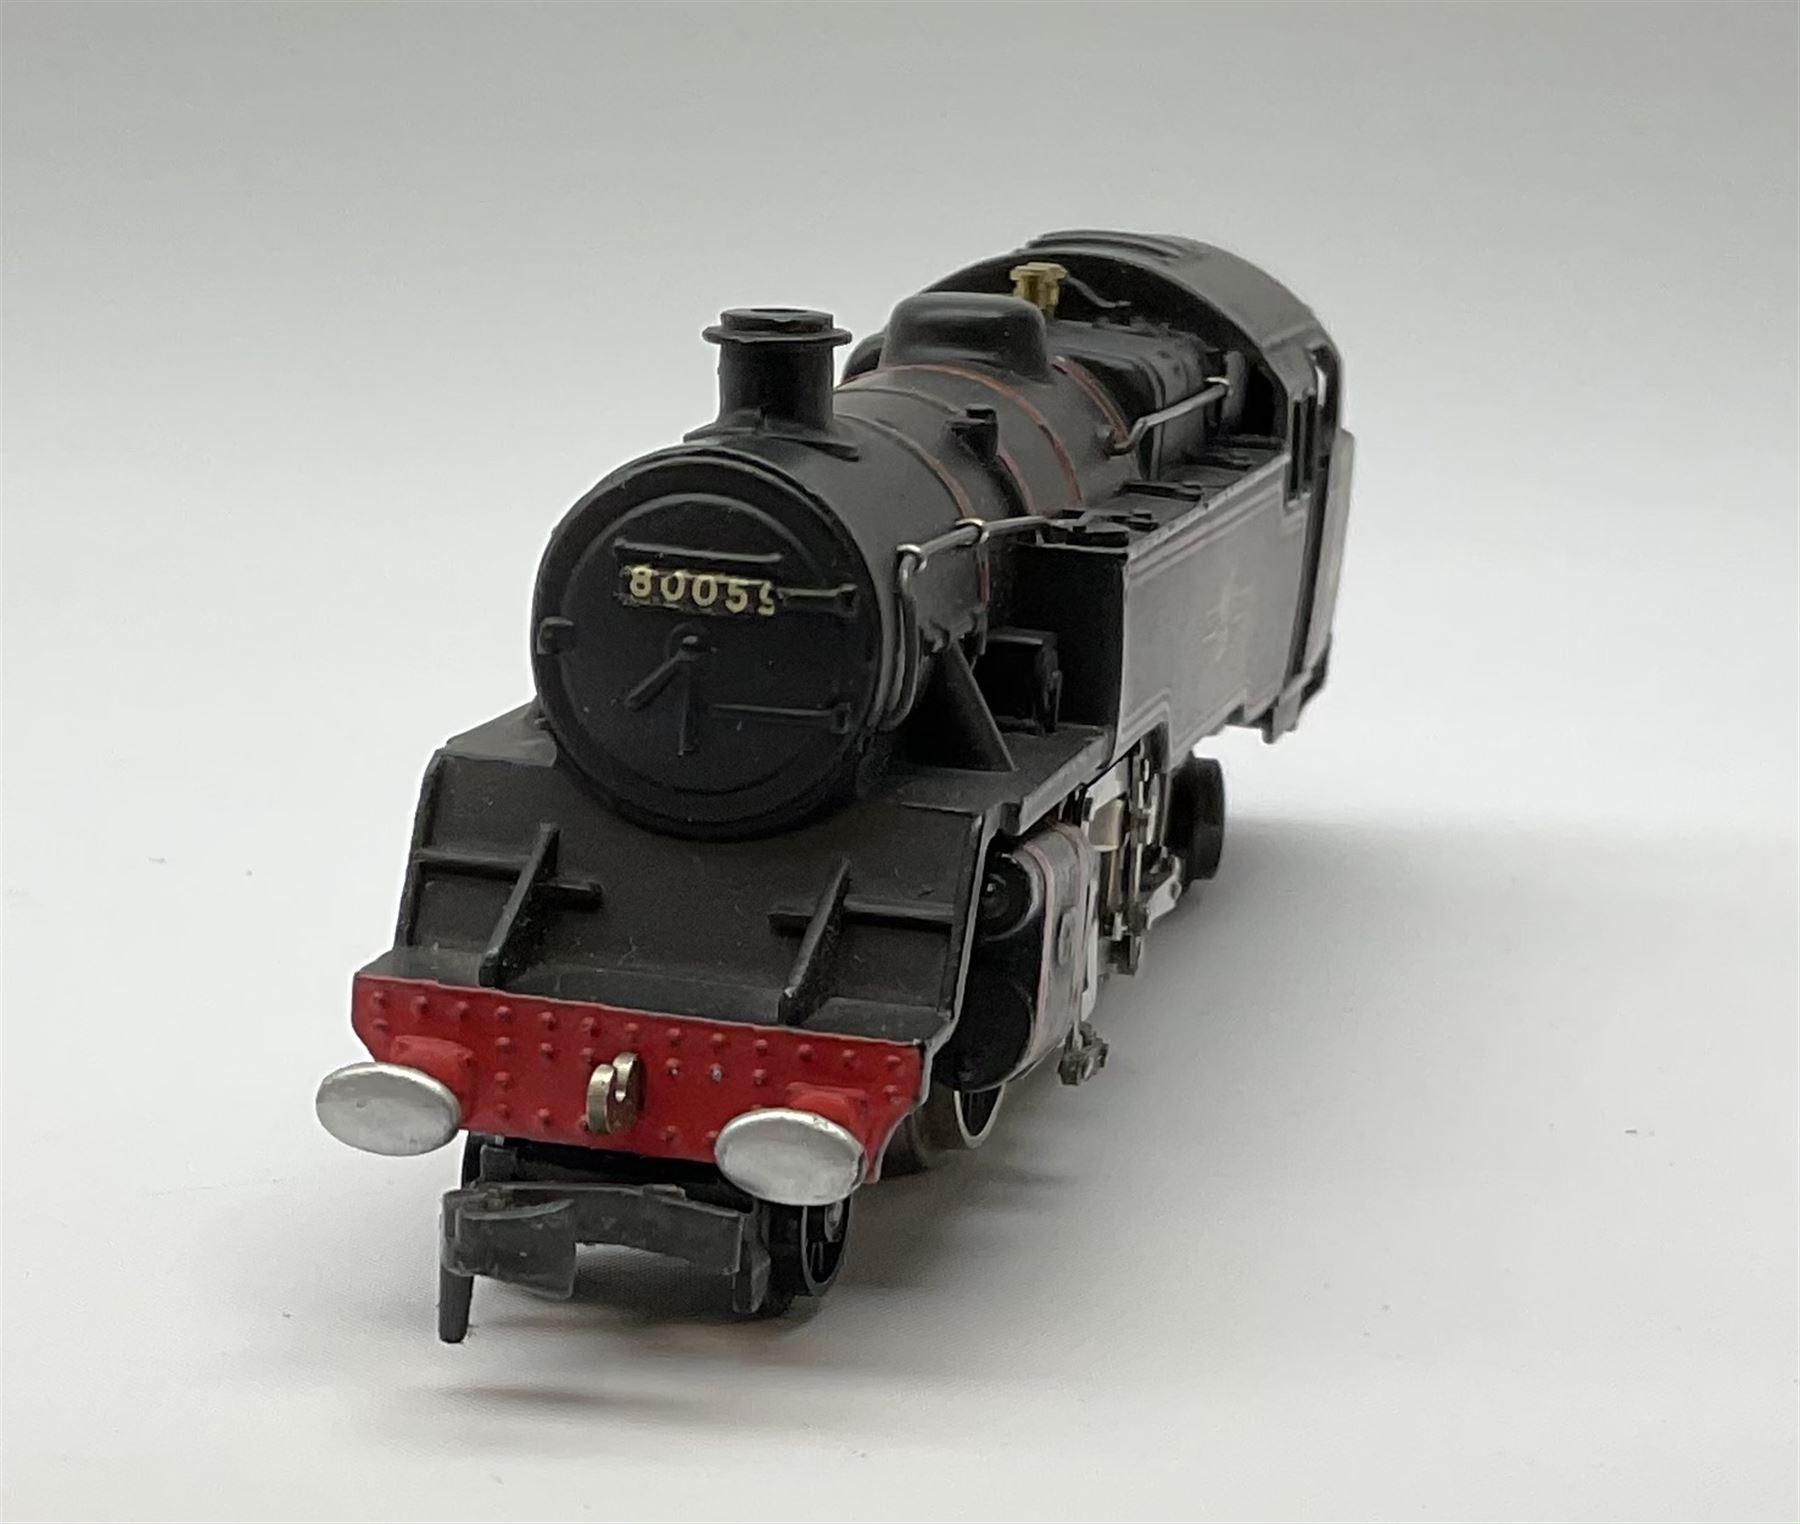 Hornby Dublo - three-rail 4MT Standard 2-6-4 Tank locomotive No.80059 with totems facing forward - Image 4 of 6